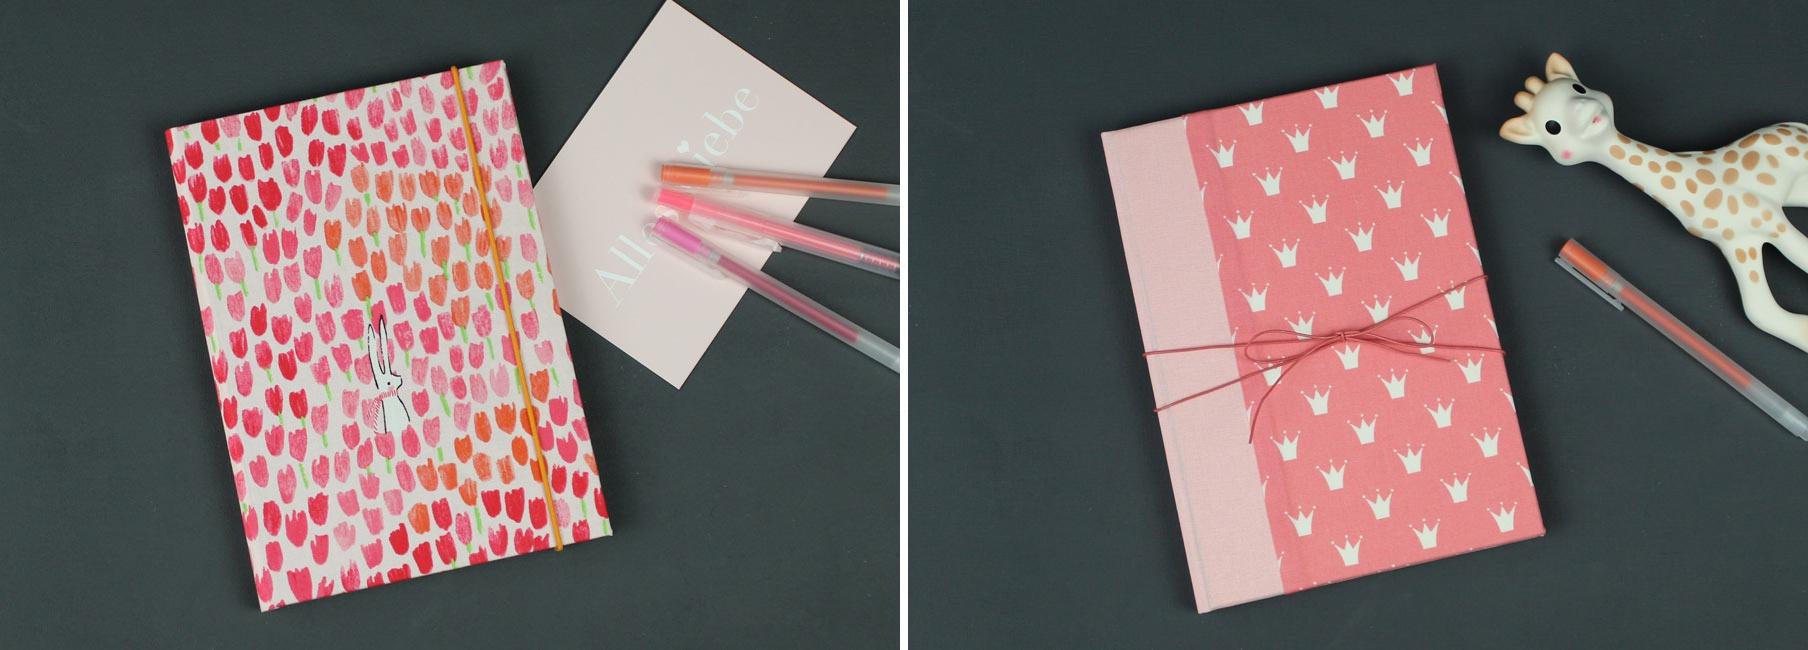 Tagebuch Baby, Scatoli, Buch, Handmade